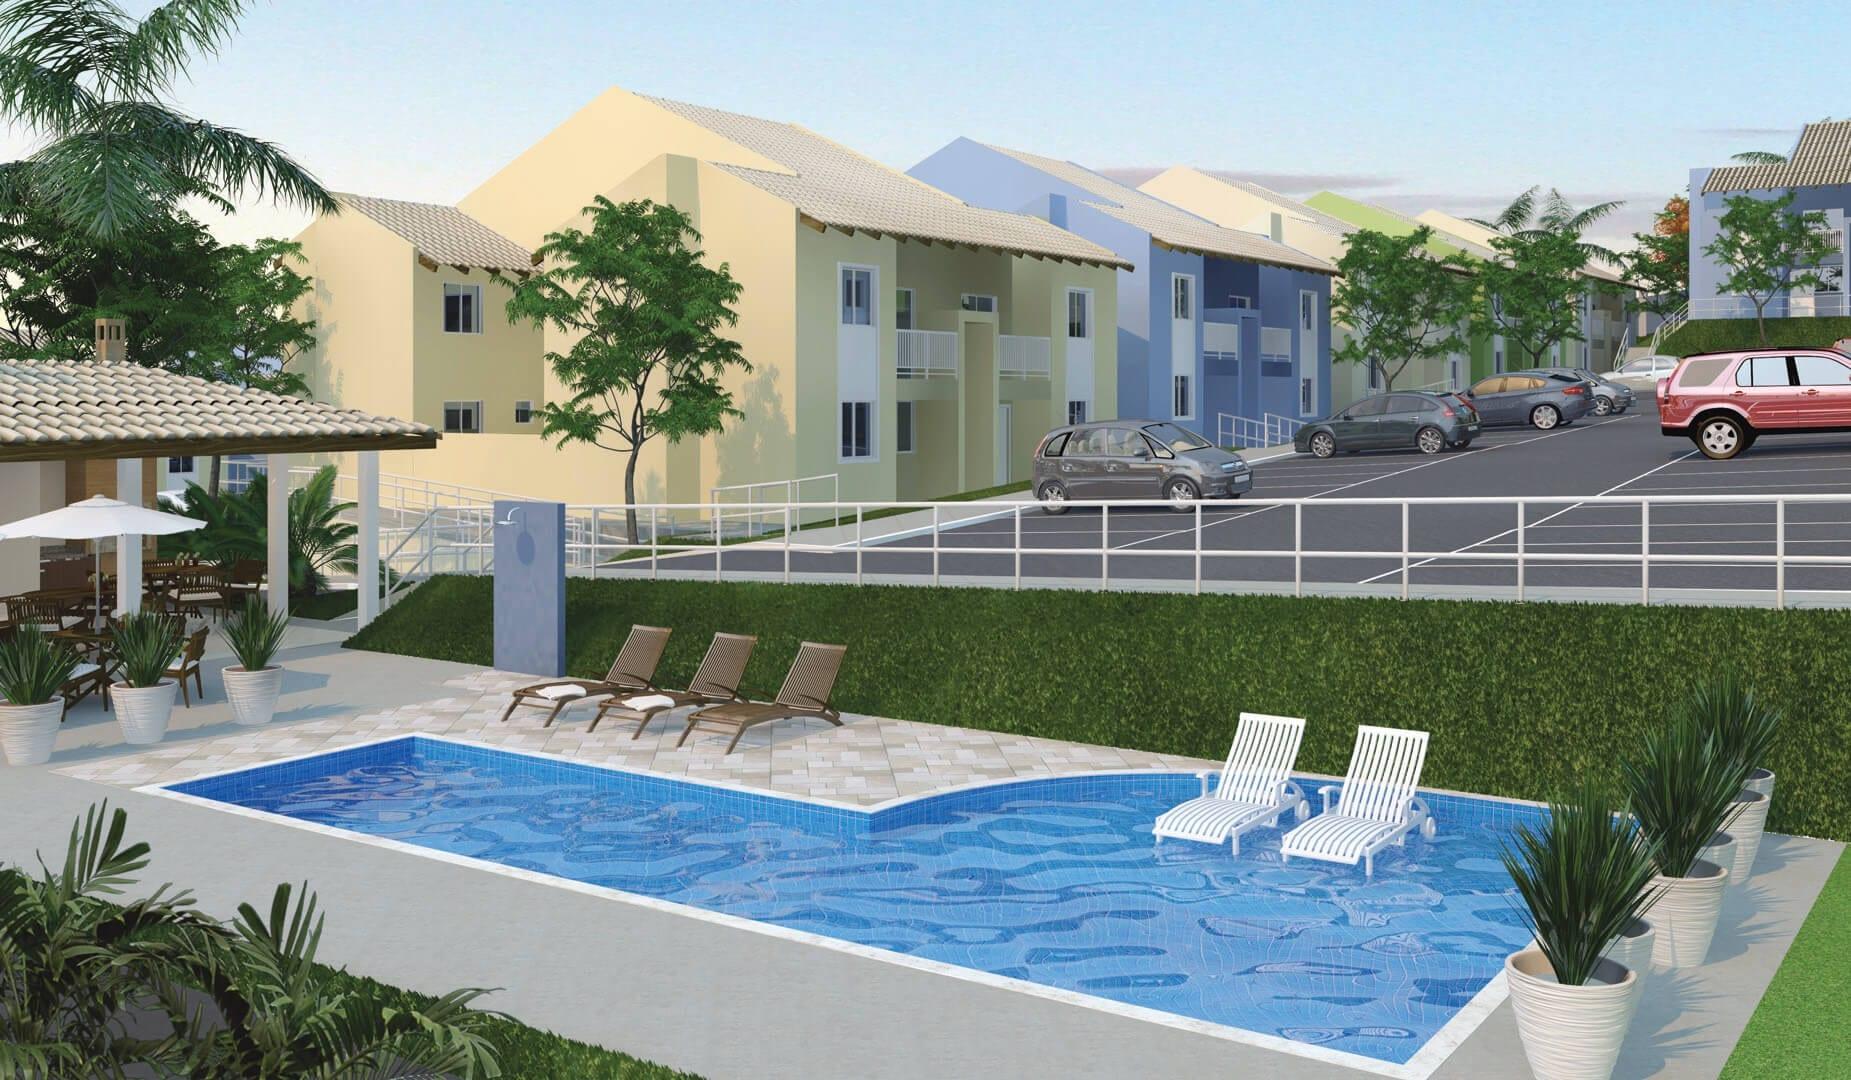 vic-engenharia-villa-bella-lyon-piscina